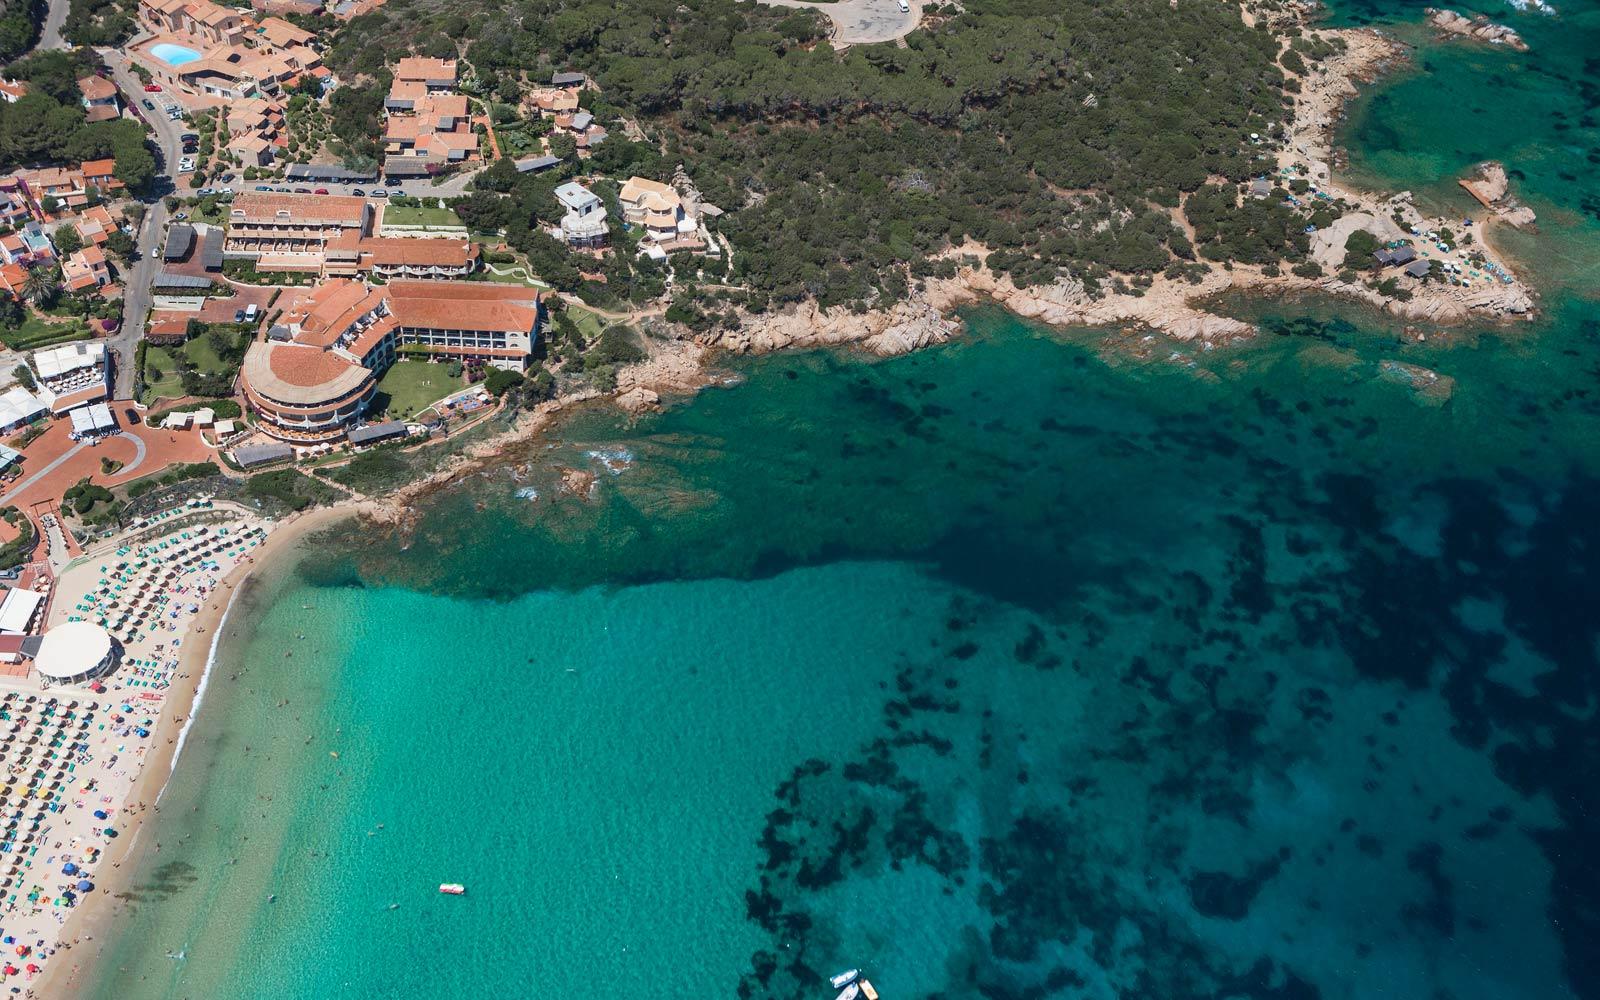 Aerial view - Club Hotel